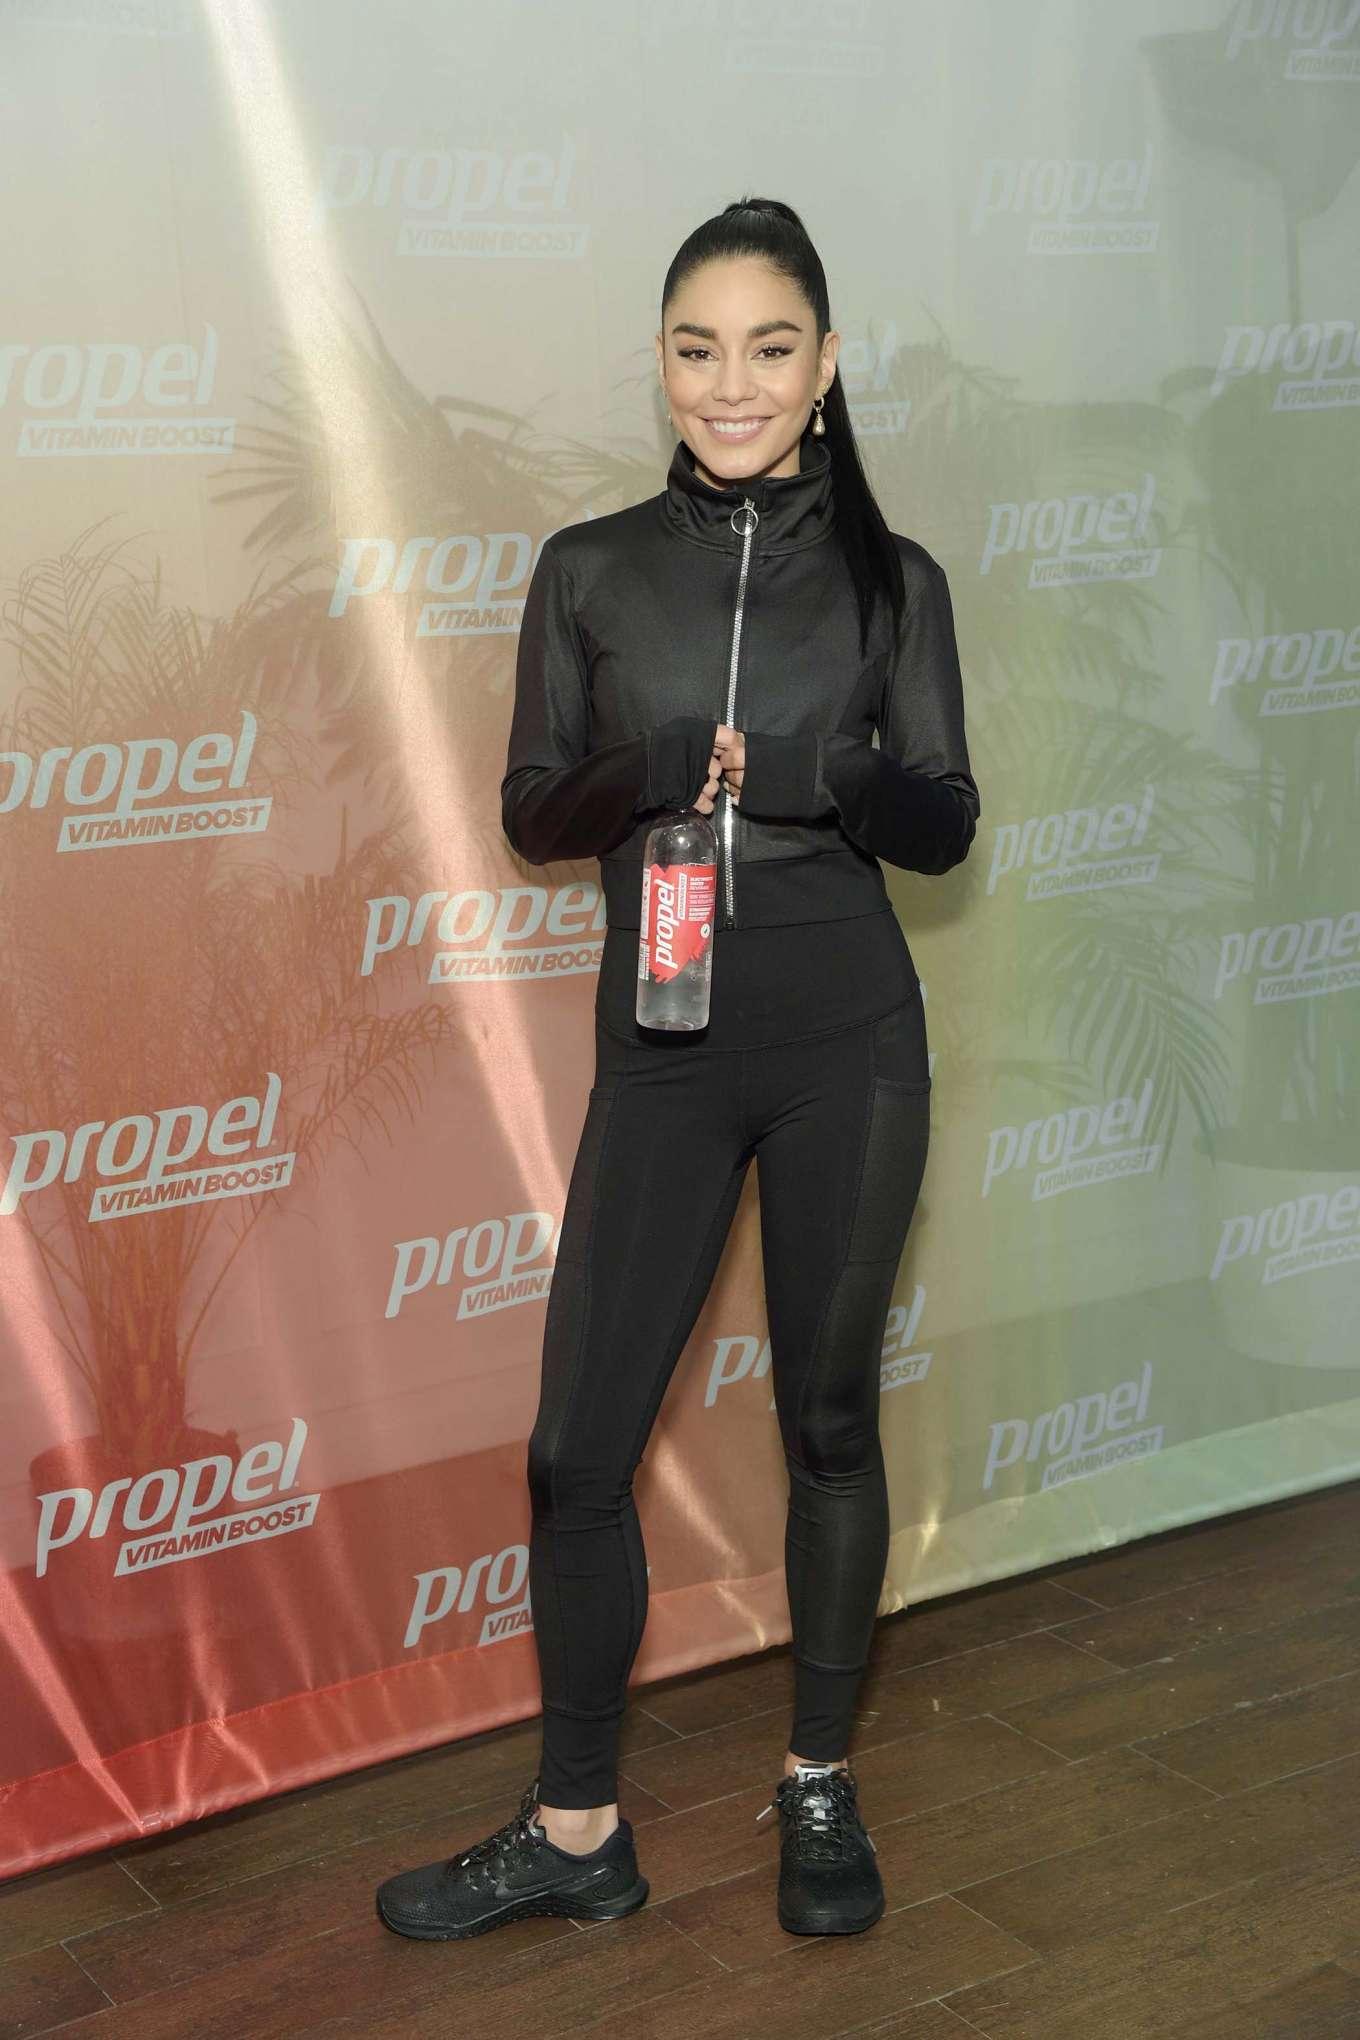 Vanessa Hudgens 2019 : Vanessa Hudgens: Works out with Propel Vitamin Boost -16